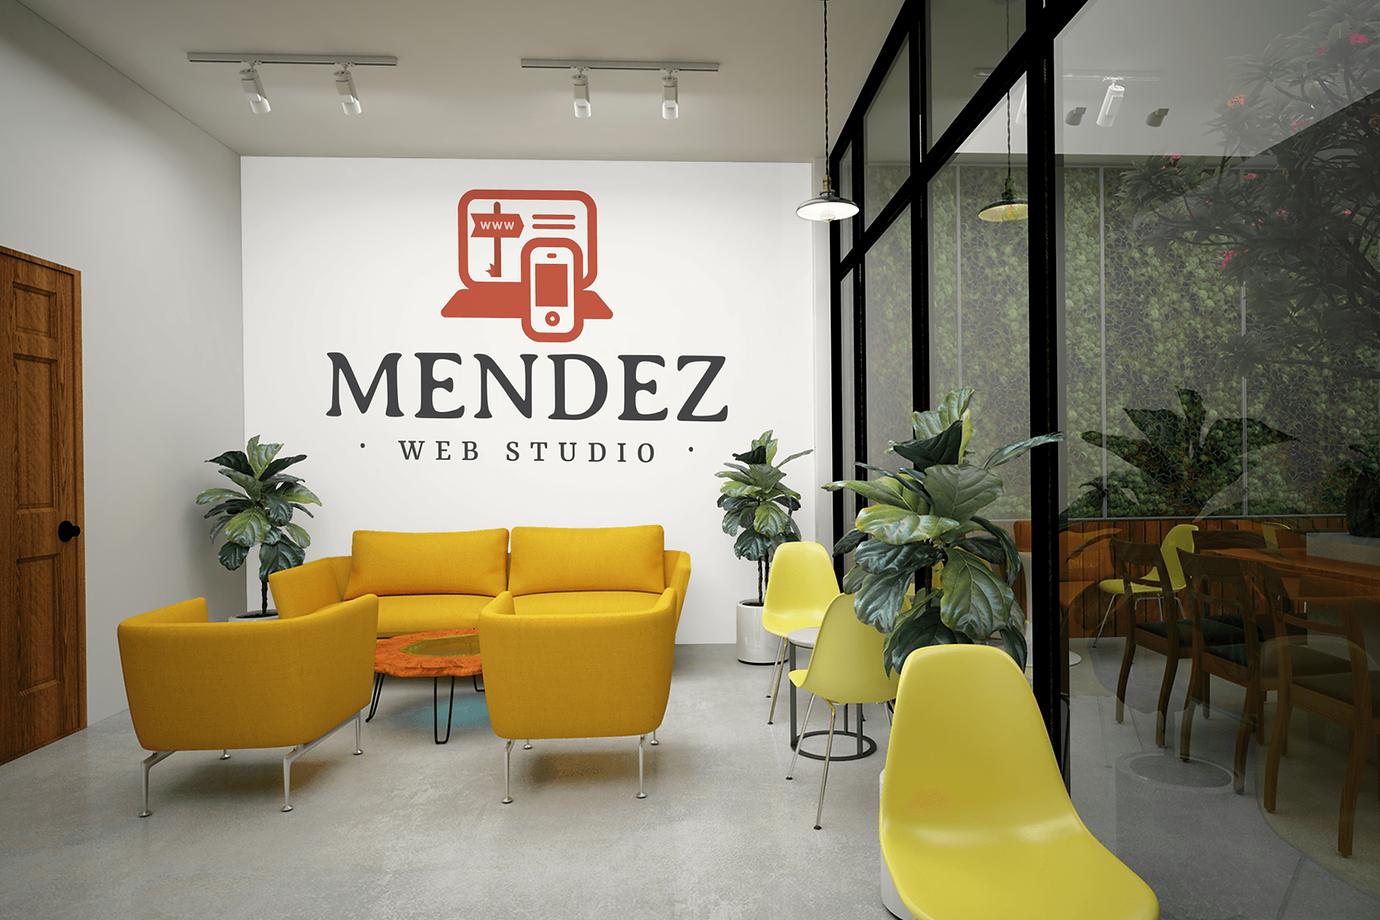 Mendez Web Studio Meeting Room Mockup